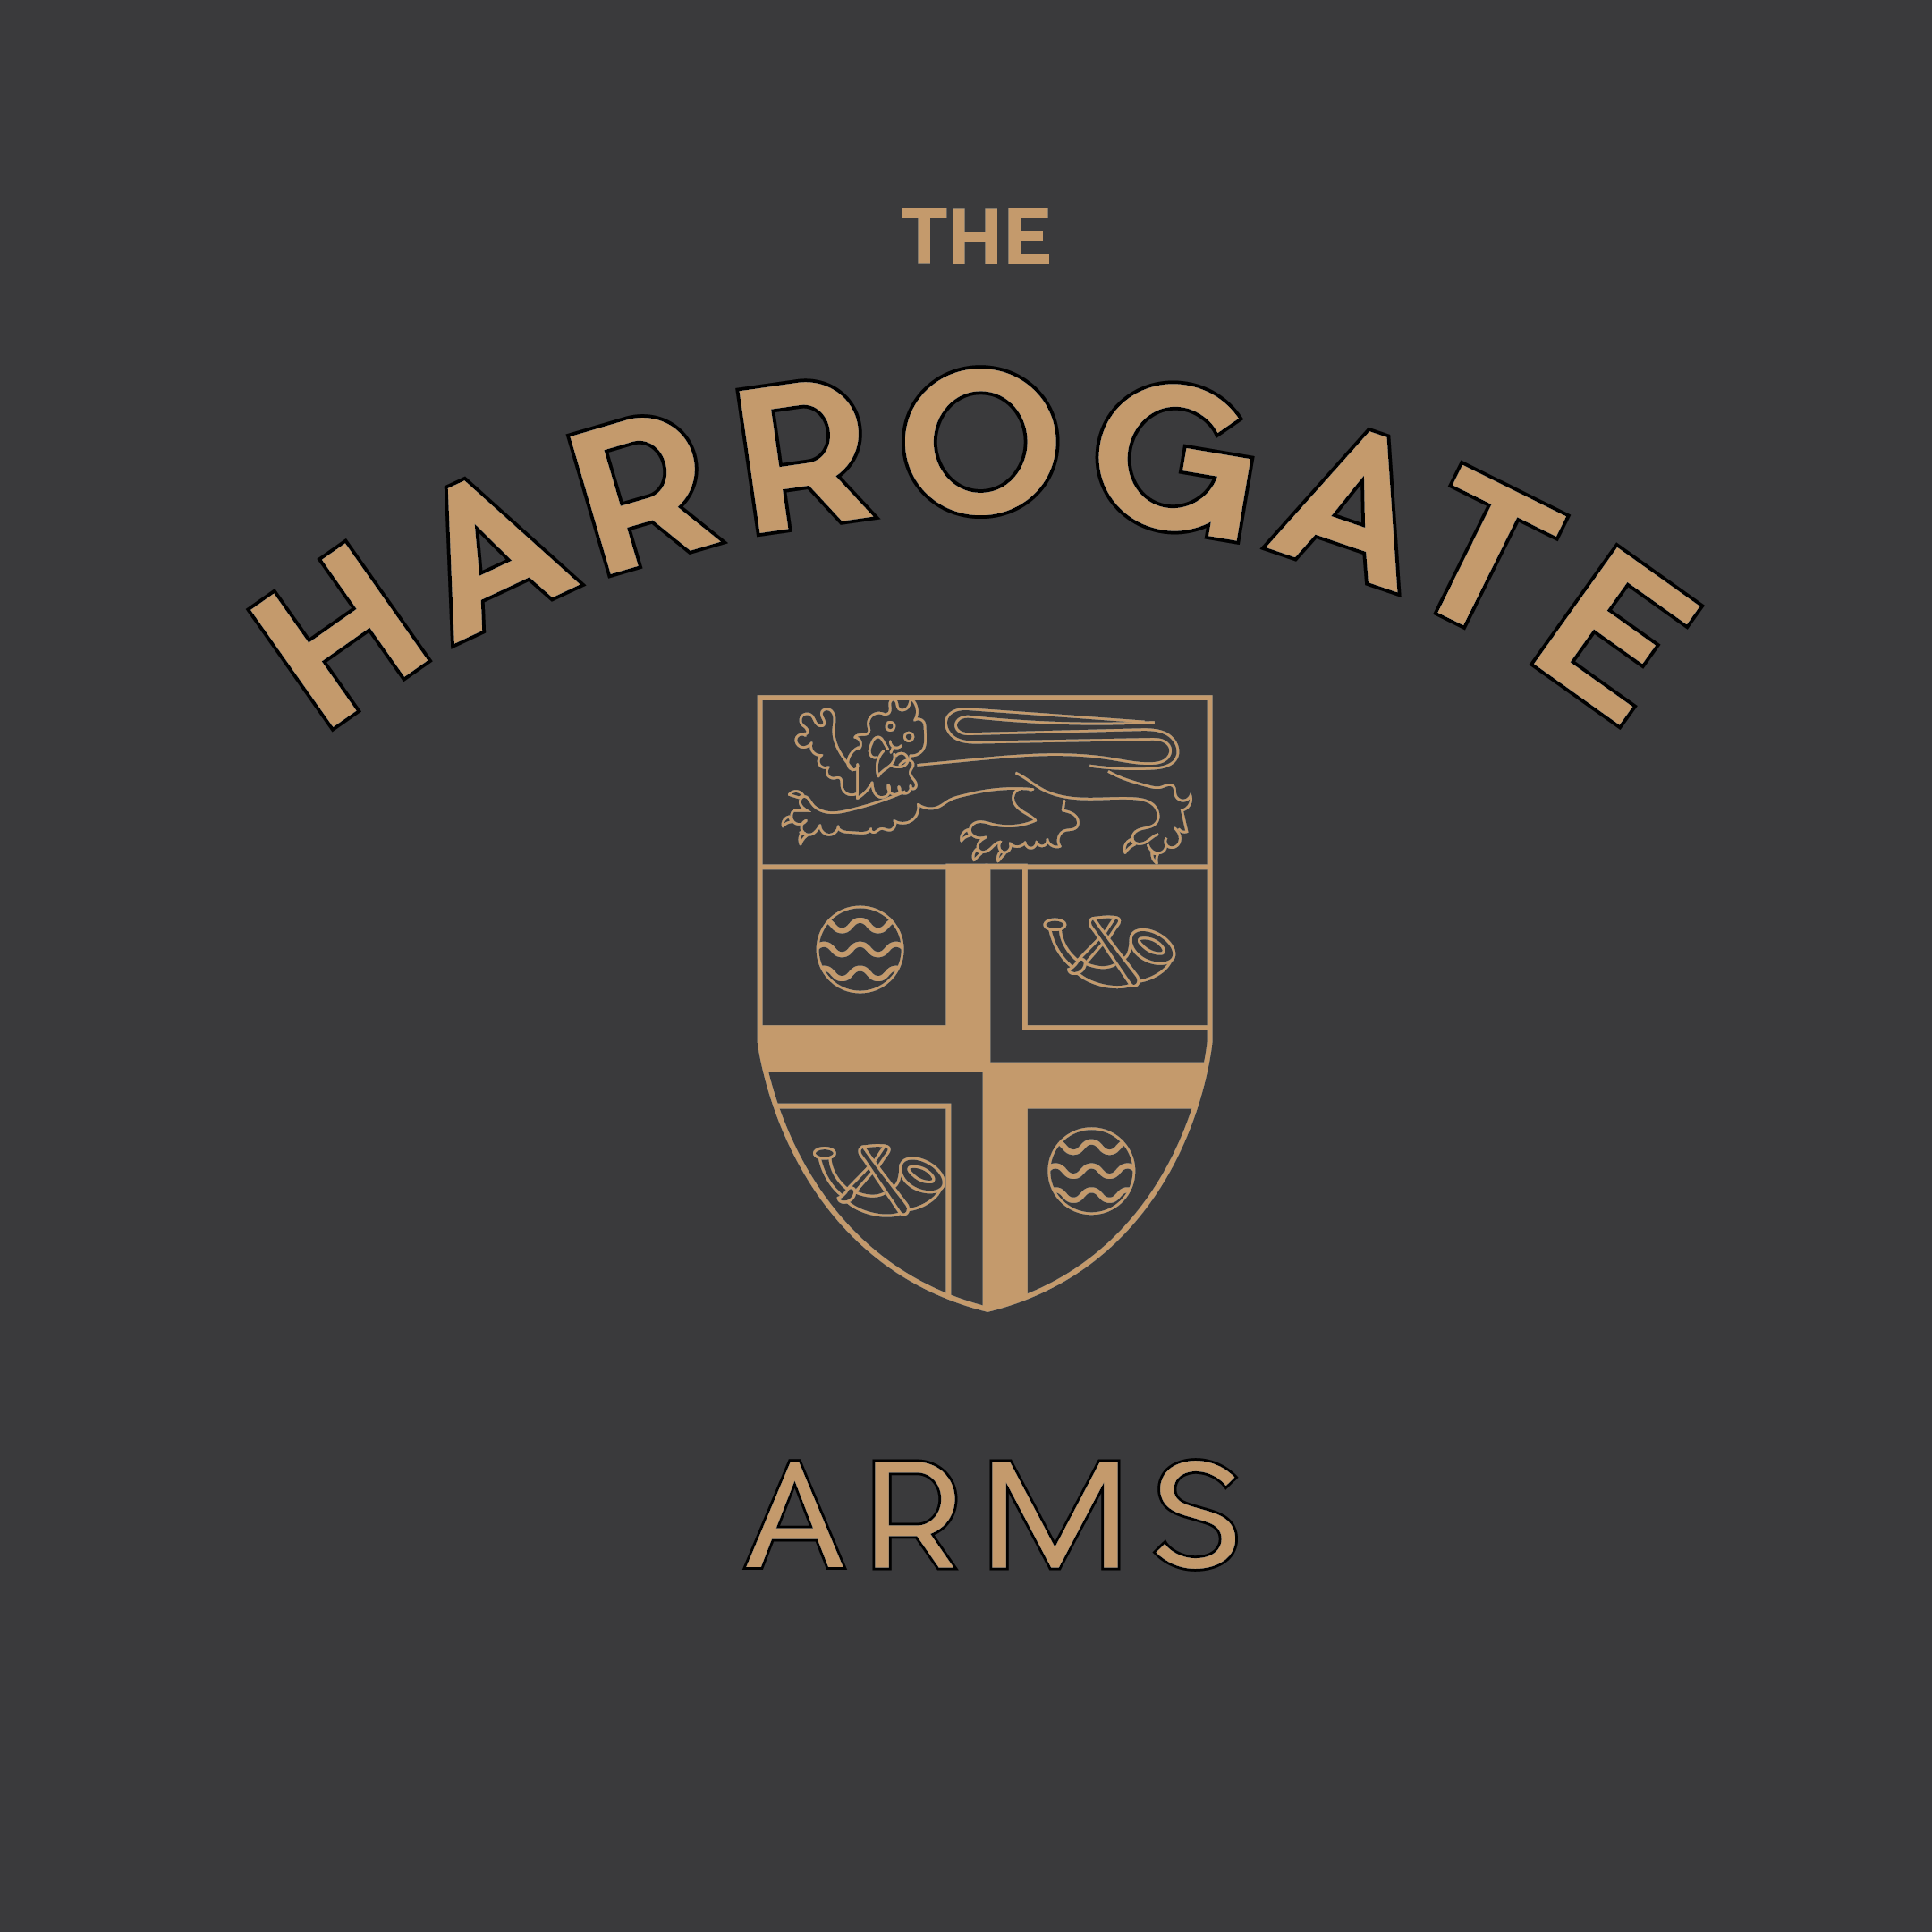 The Harrogate Arms